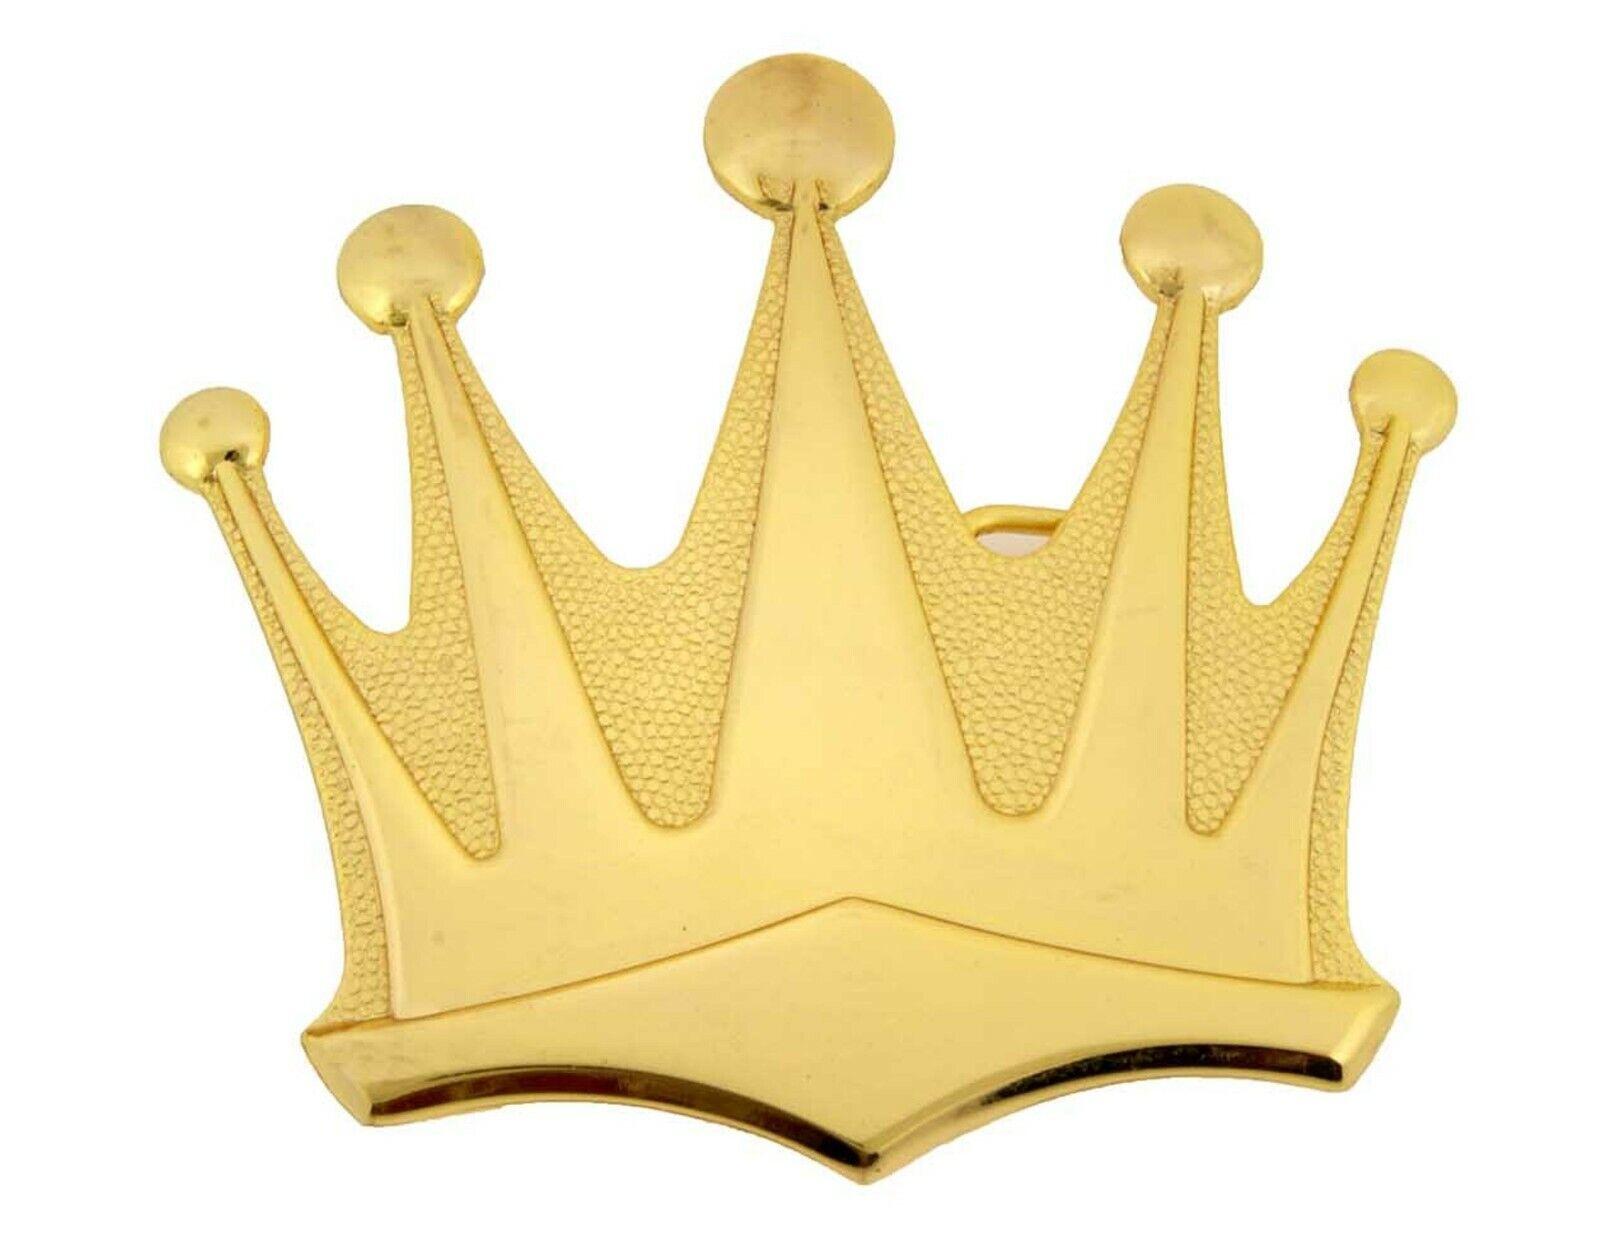 Crown Belt Buckle Western Rodeo Cowboy Gold Shiny Metal King Royal Men Women Big